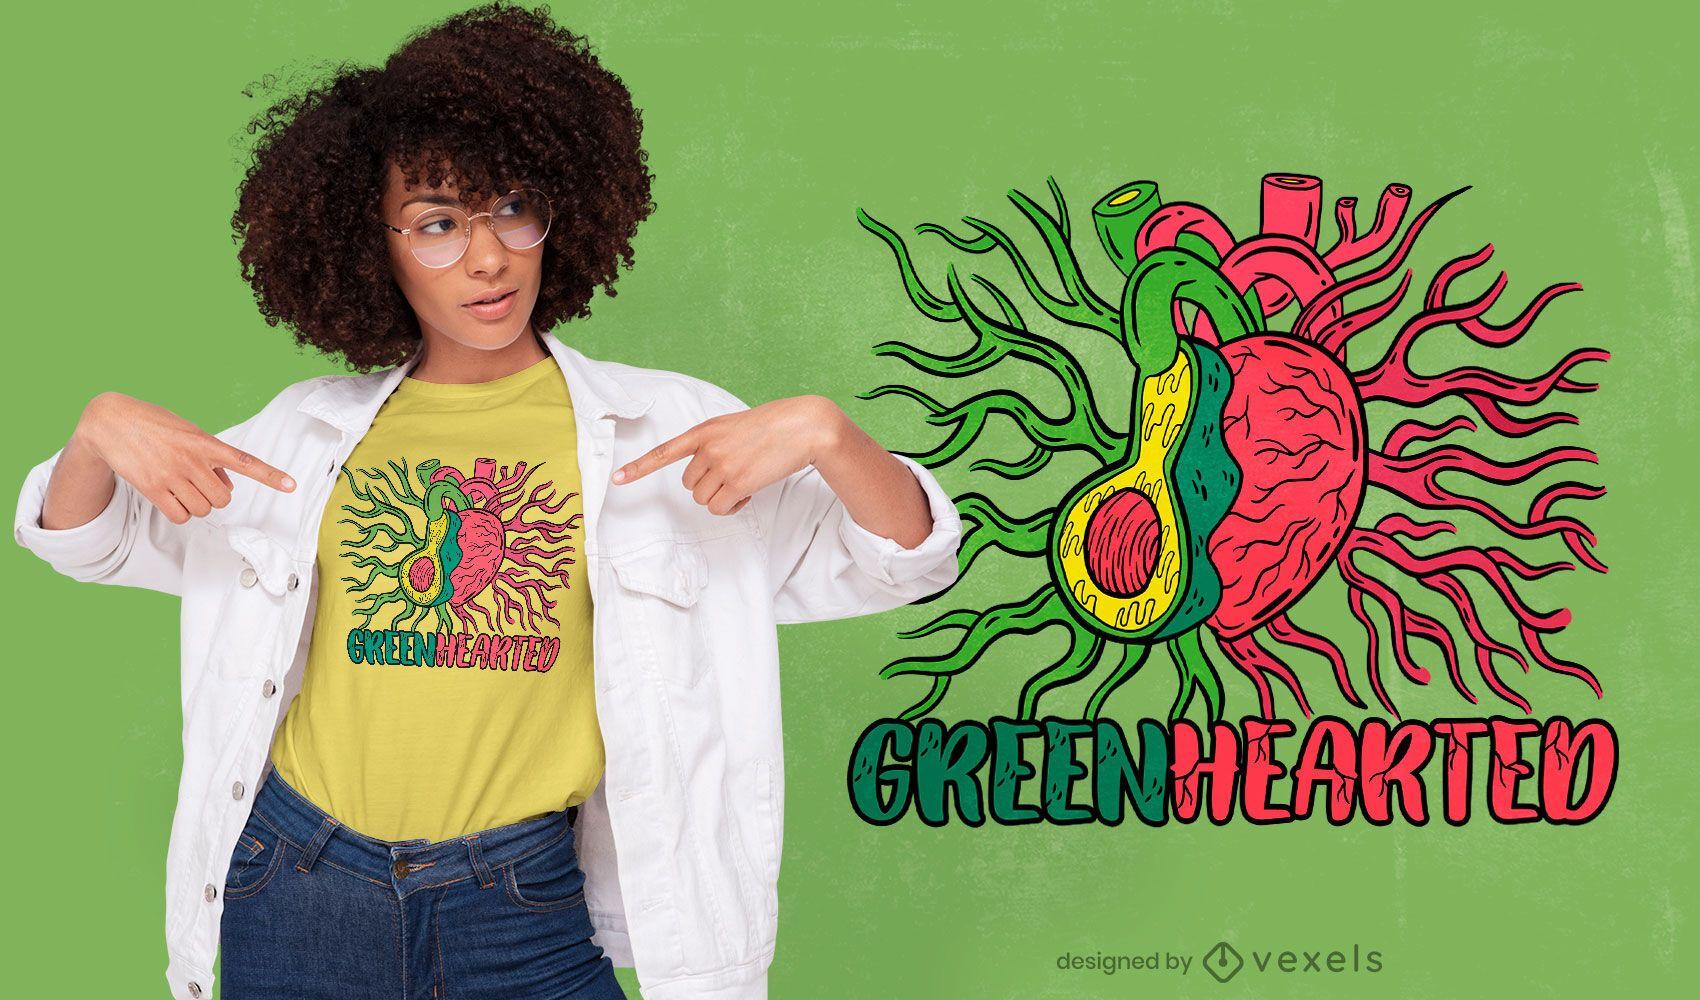 Heart and avocado system t-shirt design